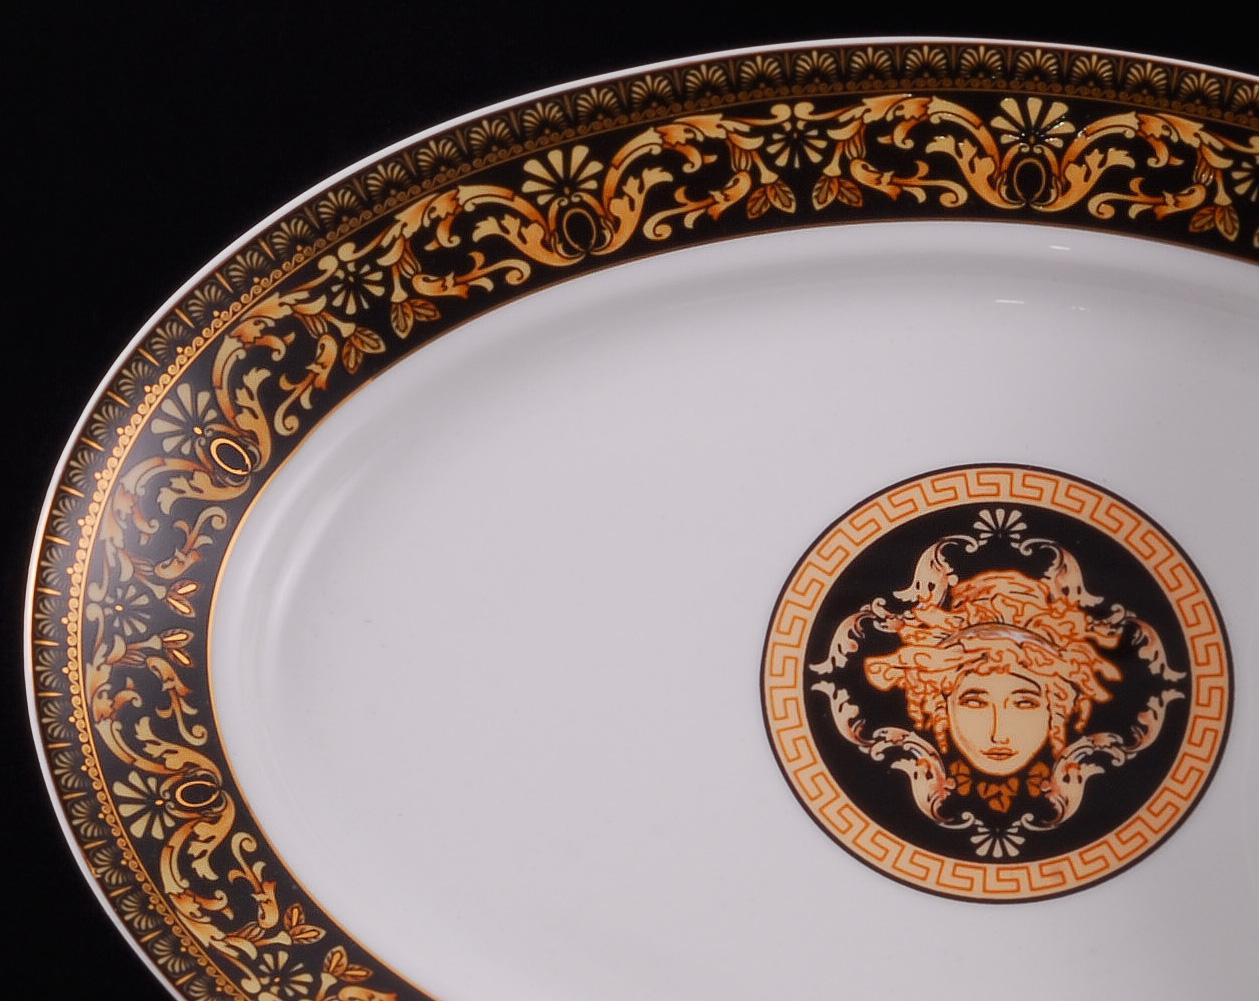 Фото Блюдо для гарнира овальное 22 см, Форма Сабина Флоренция антик